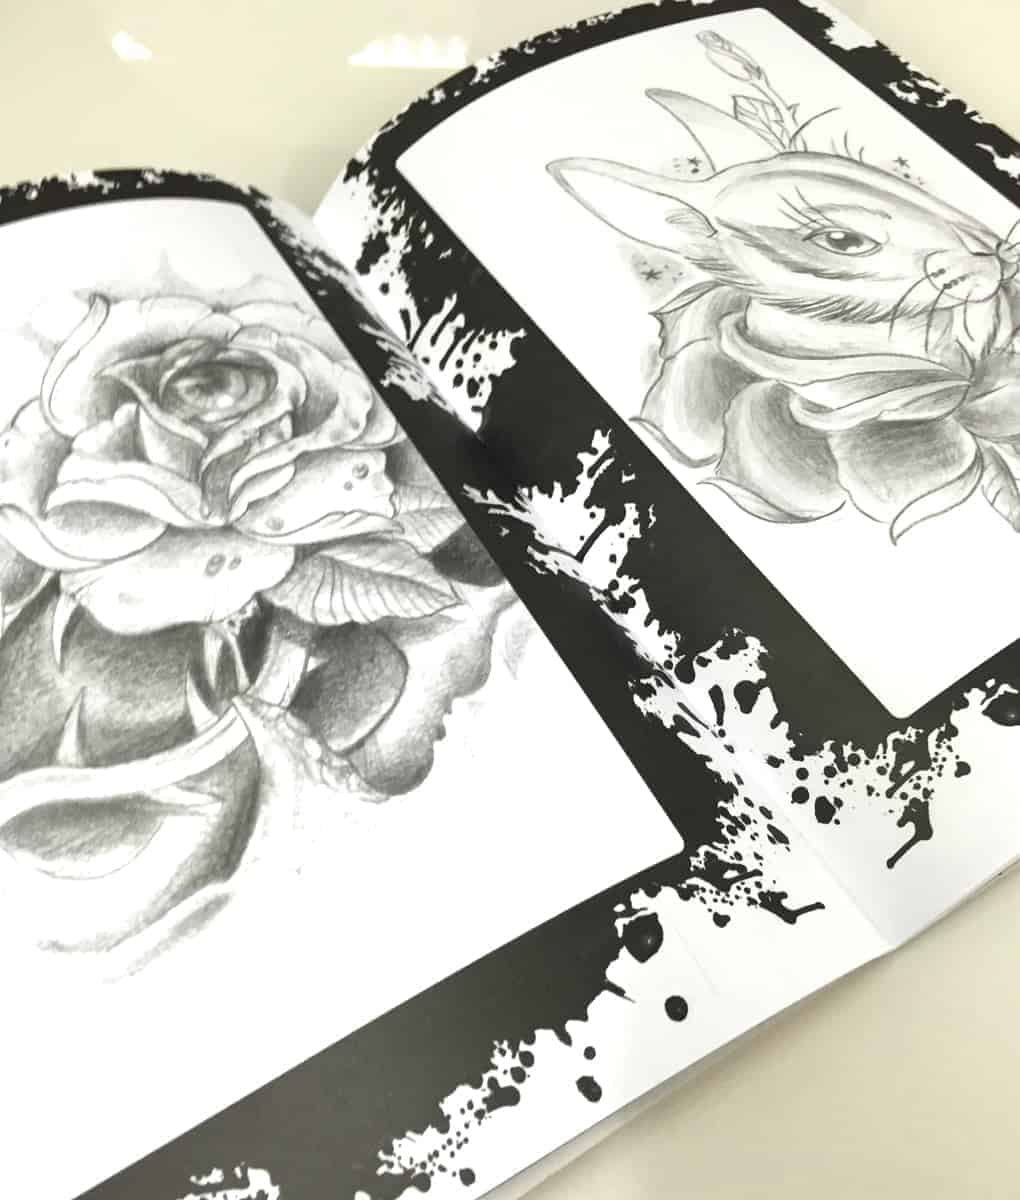 cassiano klorck sketchbook portugal